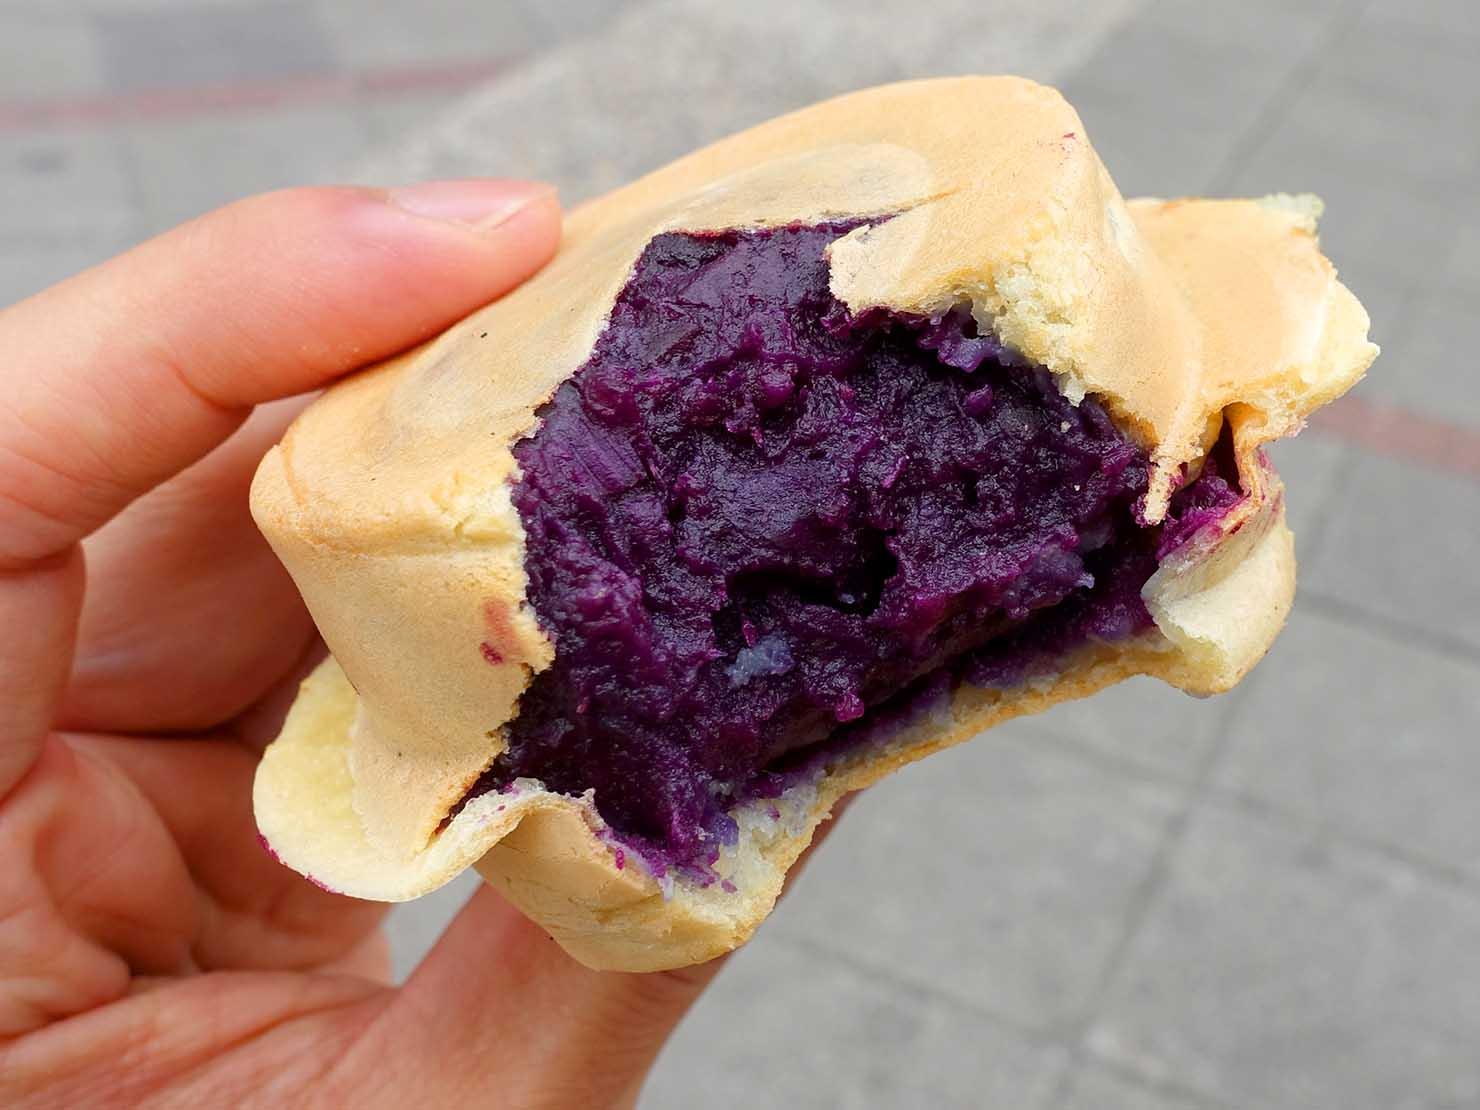 台北・迪化街の伝統グルメ店「永樂車輪餅」の紫心地瓜(紫芋)大判焼き